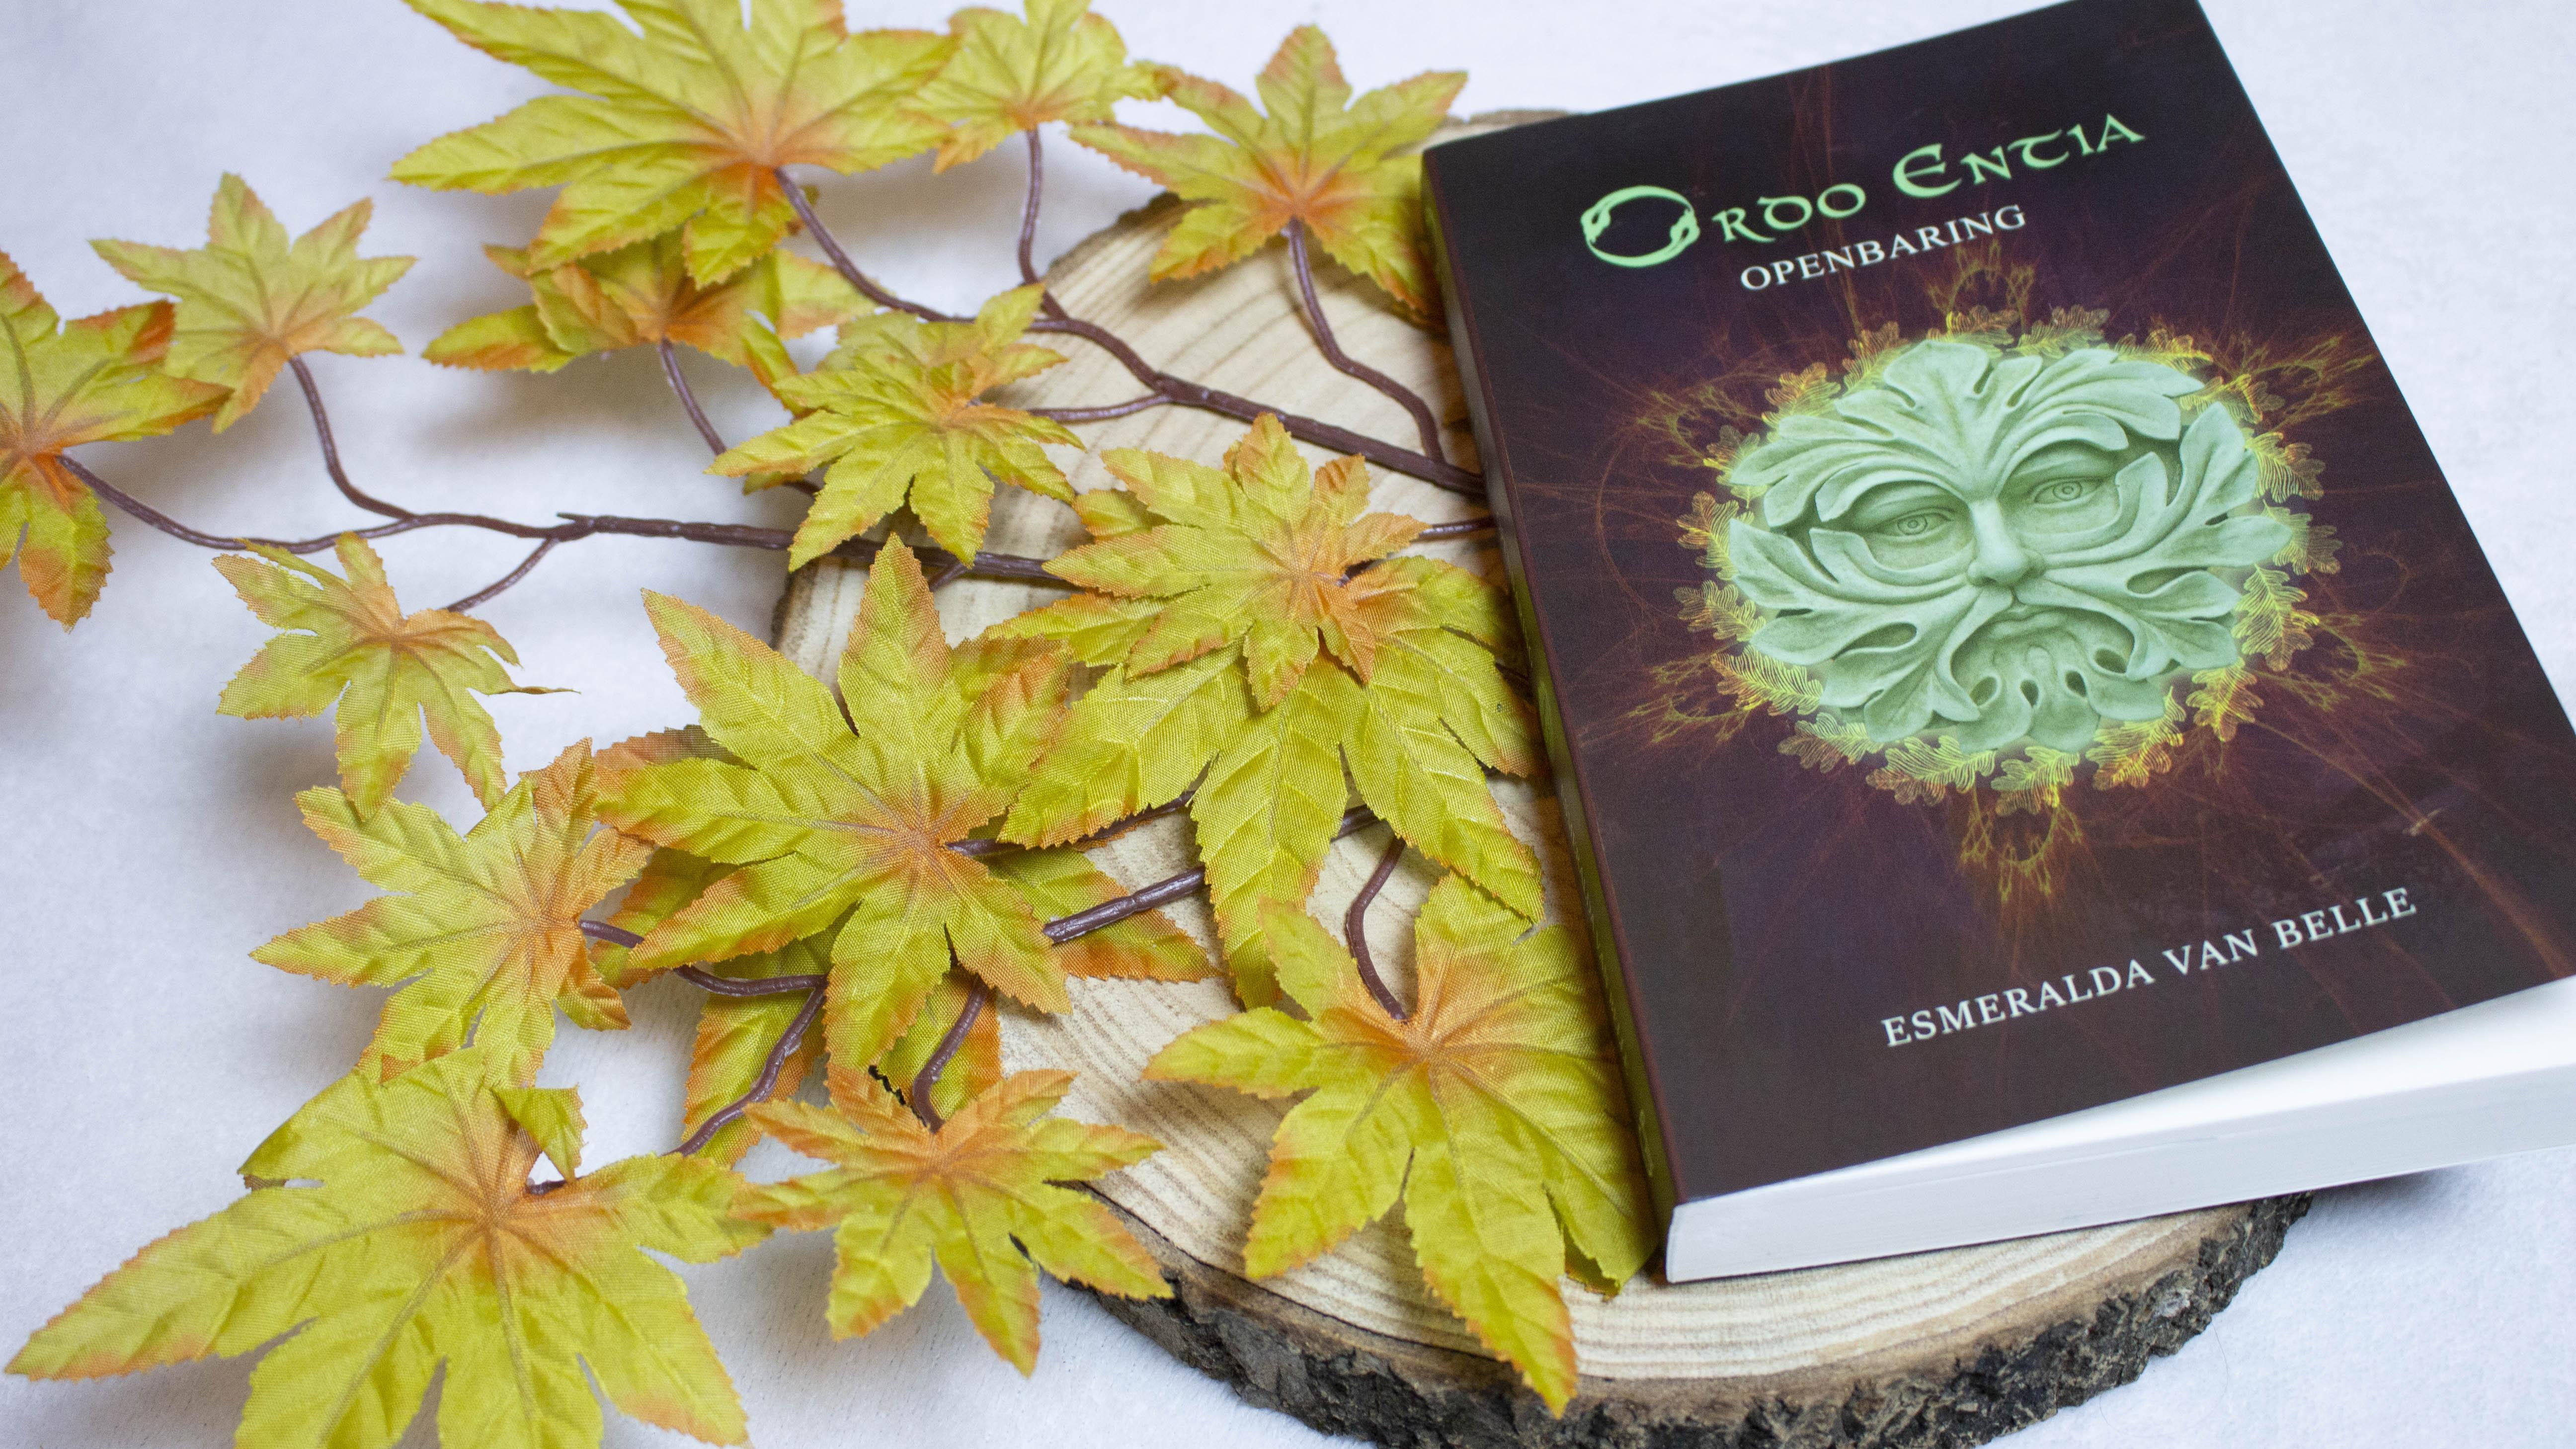 Ordo Entia | Openbaring – Esmeralda van Belle